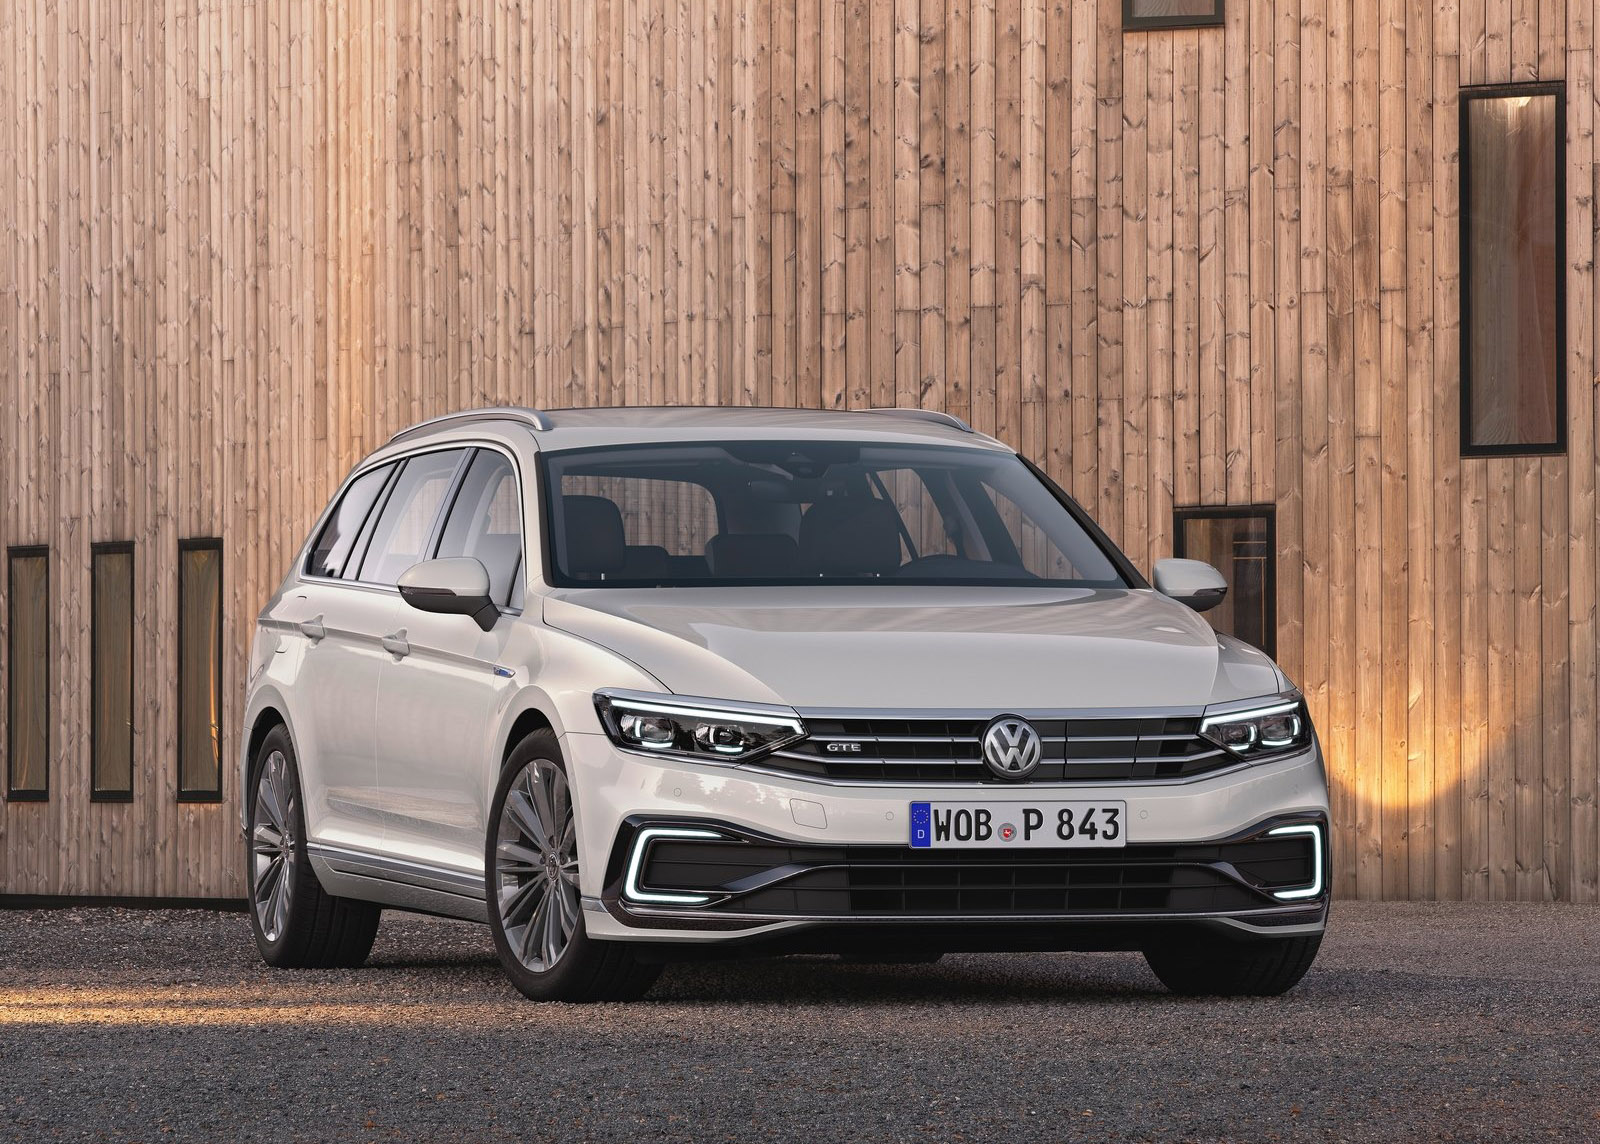 galer u00eda revista de coches  - volkswagen passat gte variant 2020